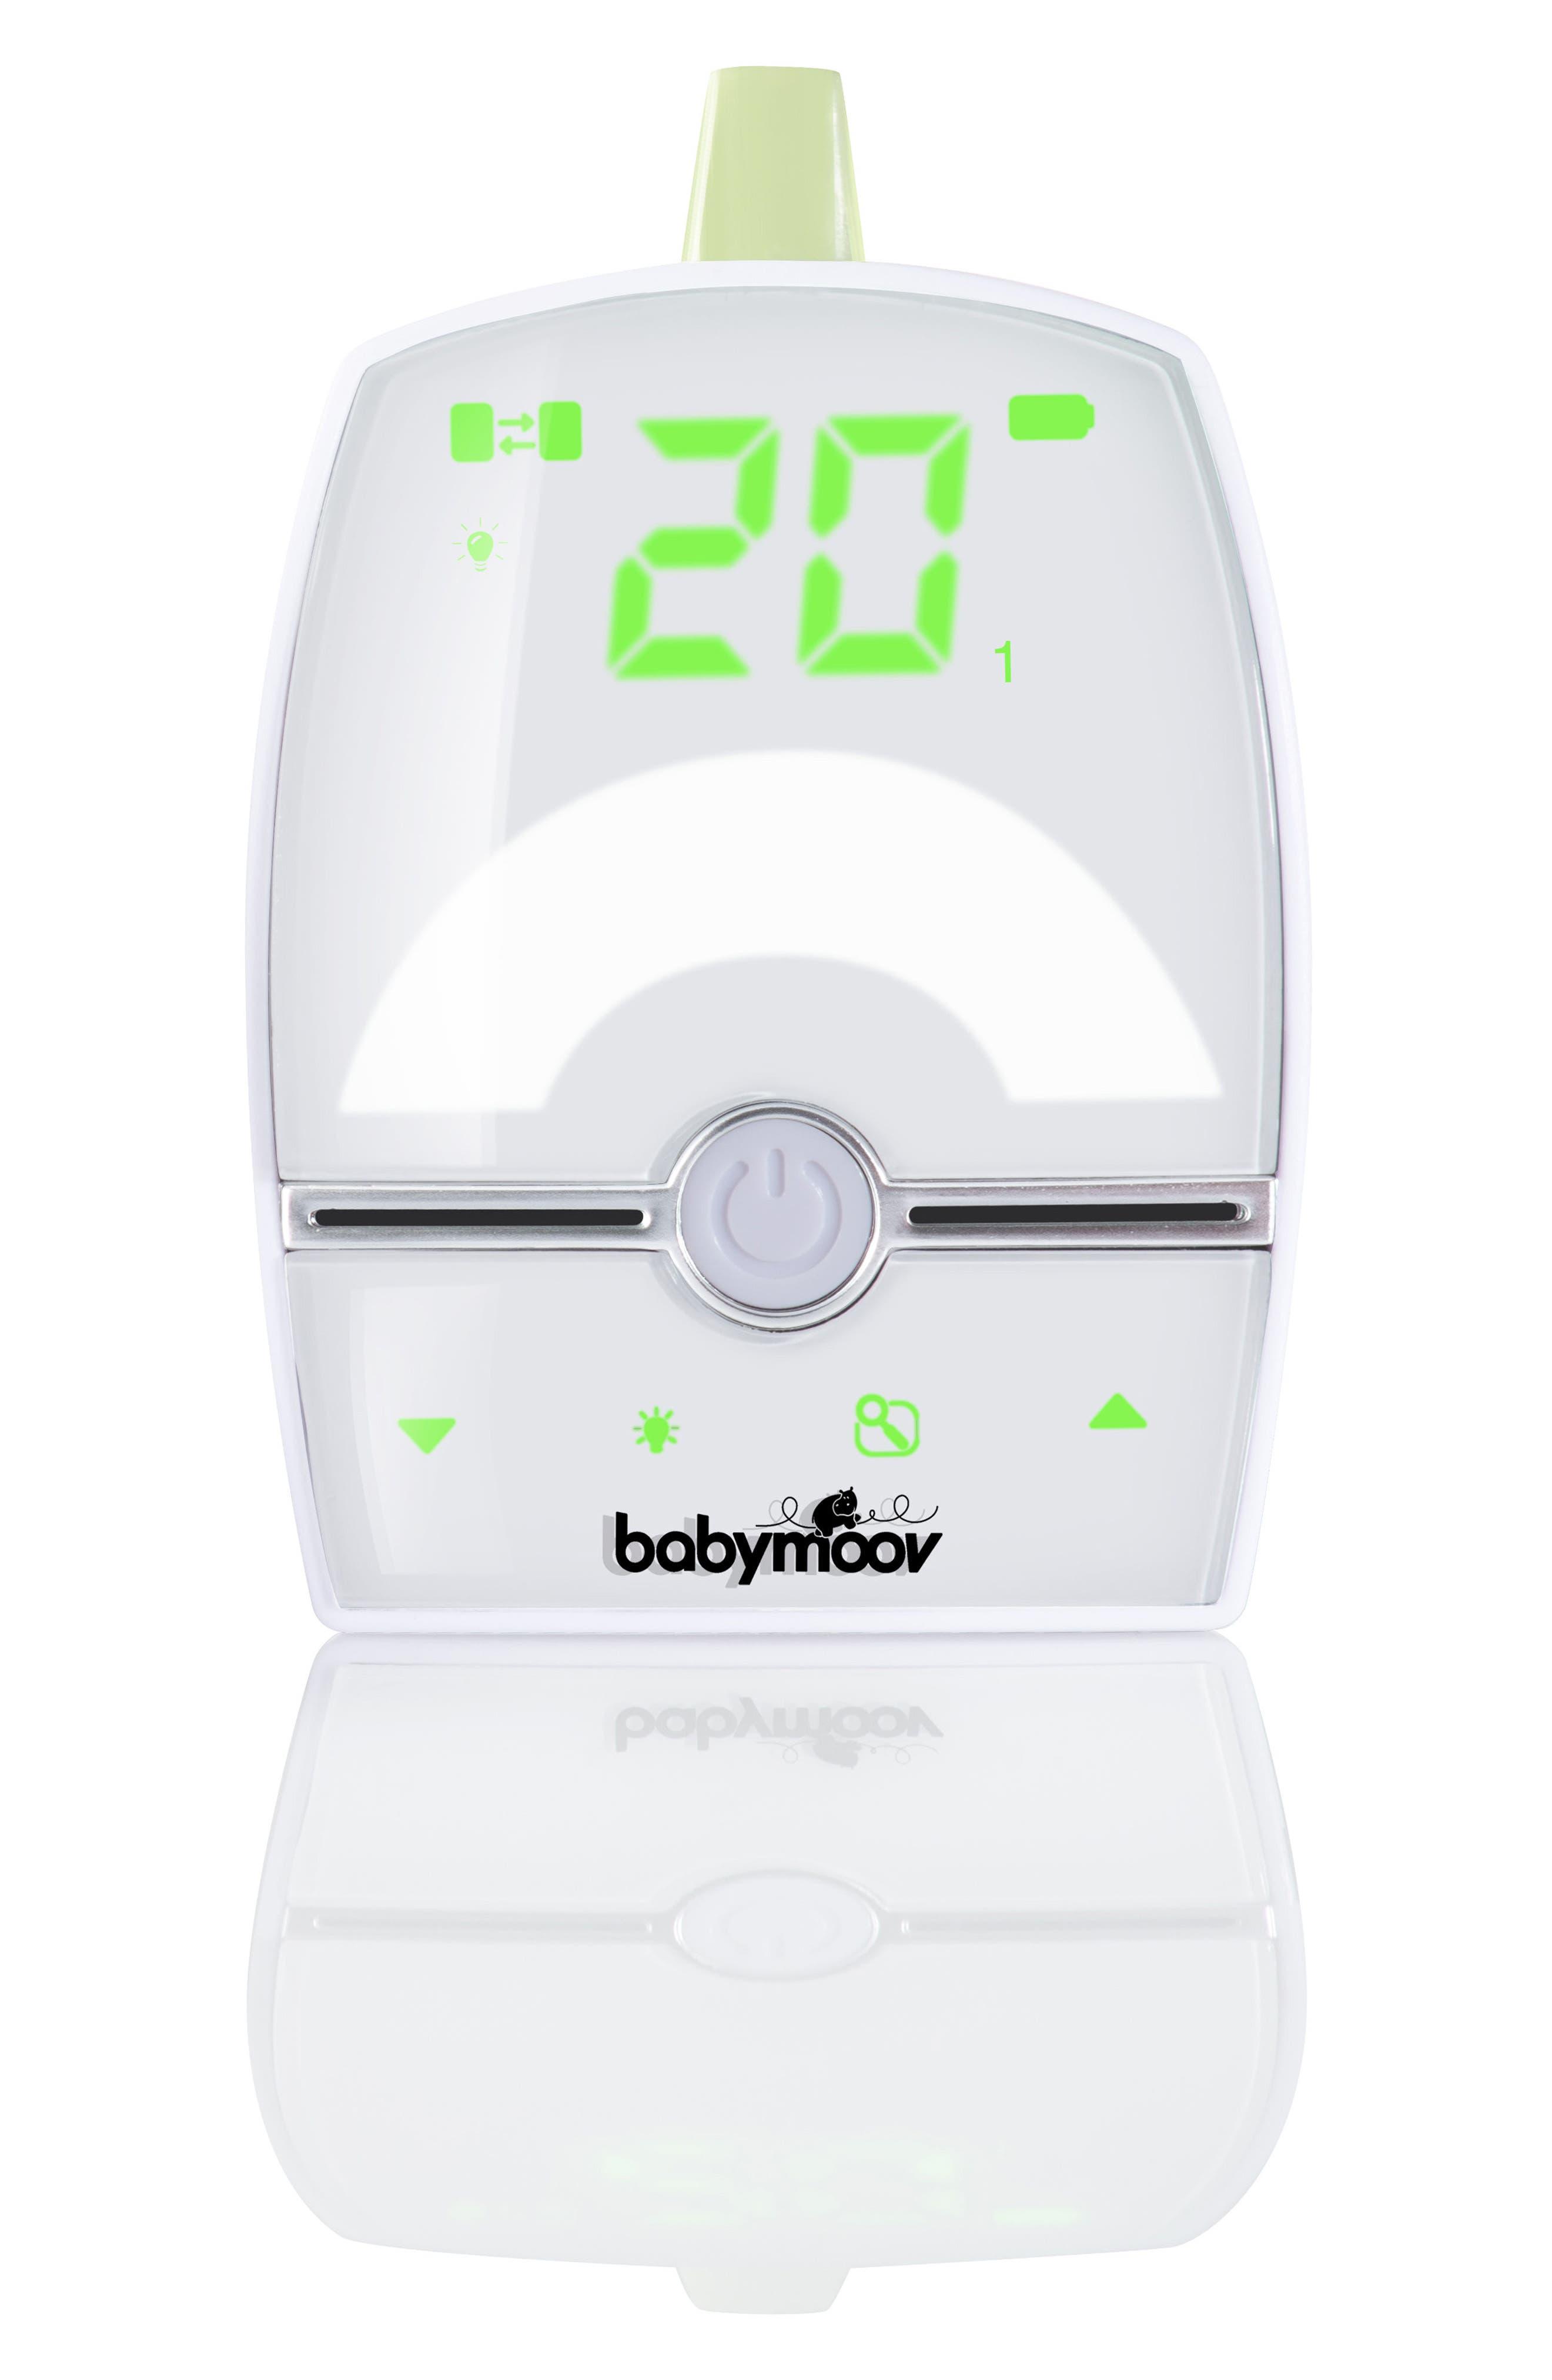 Extra Transmitter for Babymoov Premium Care Baby Moniter,                             Main thumbnail 1, color,                             100